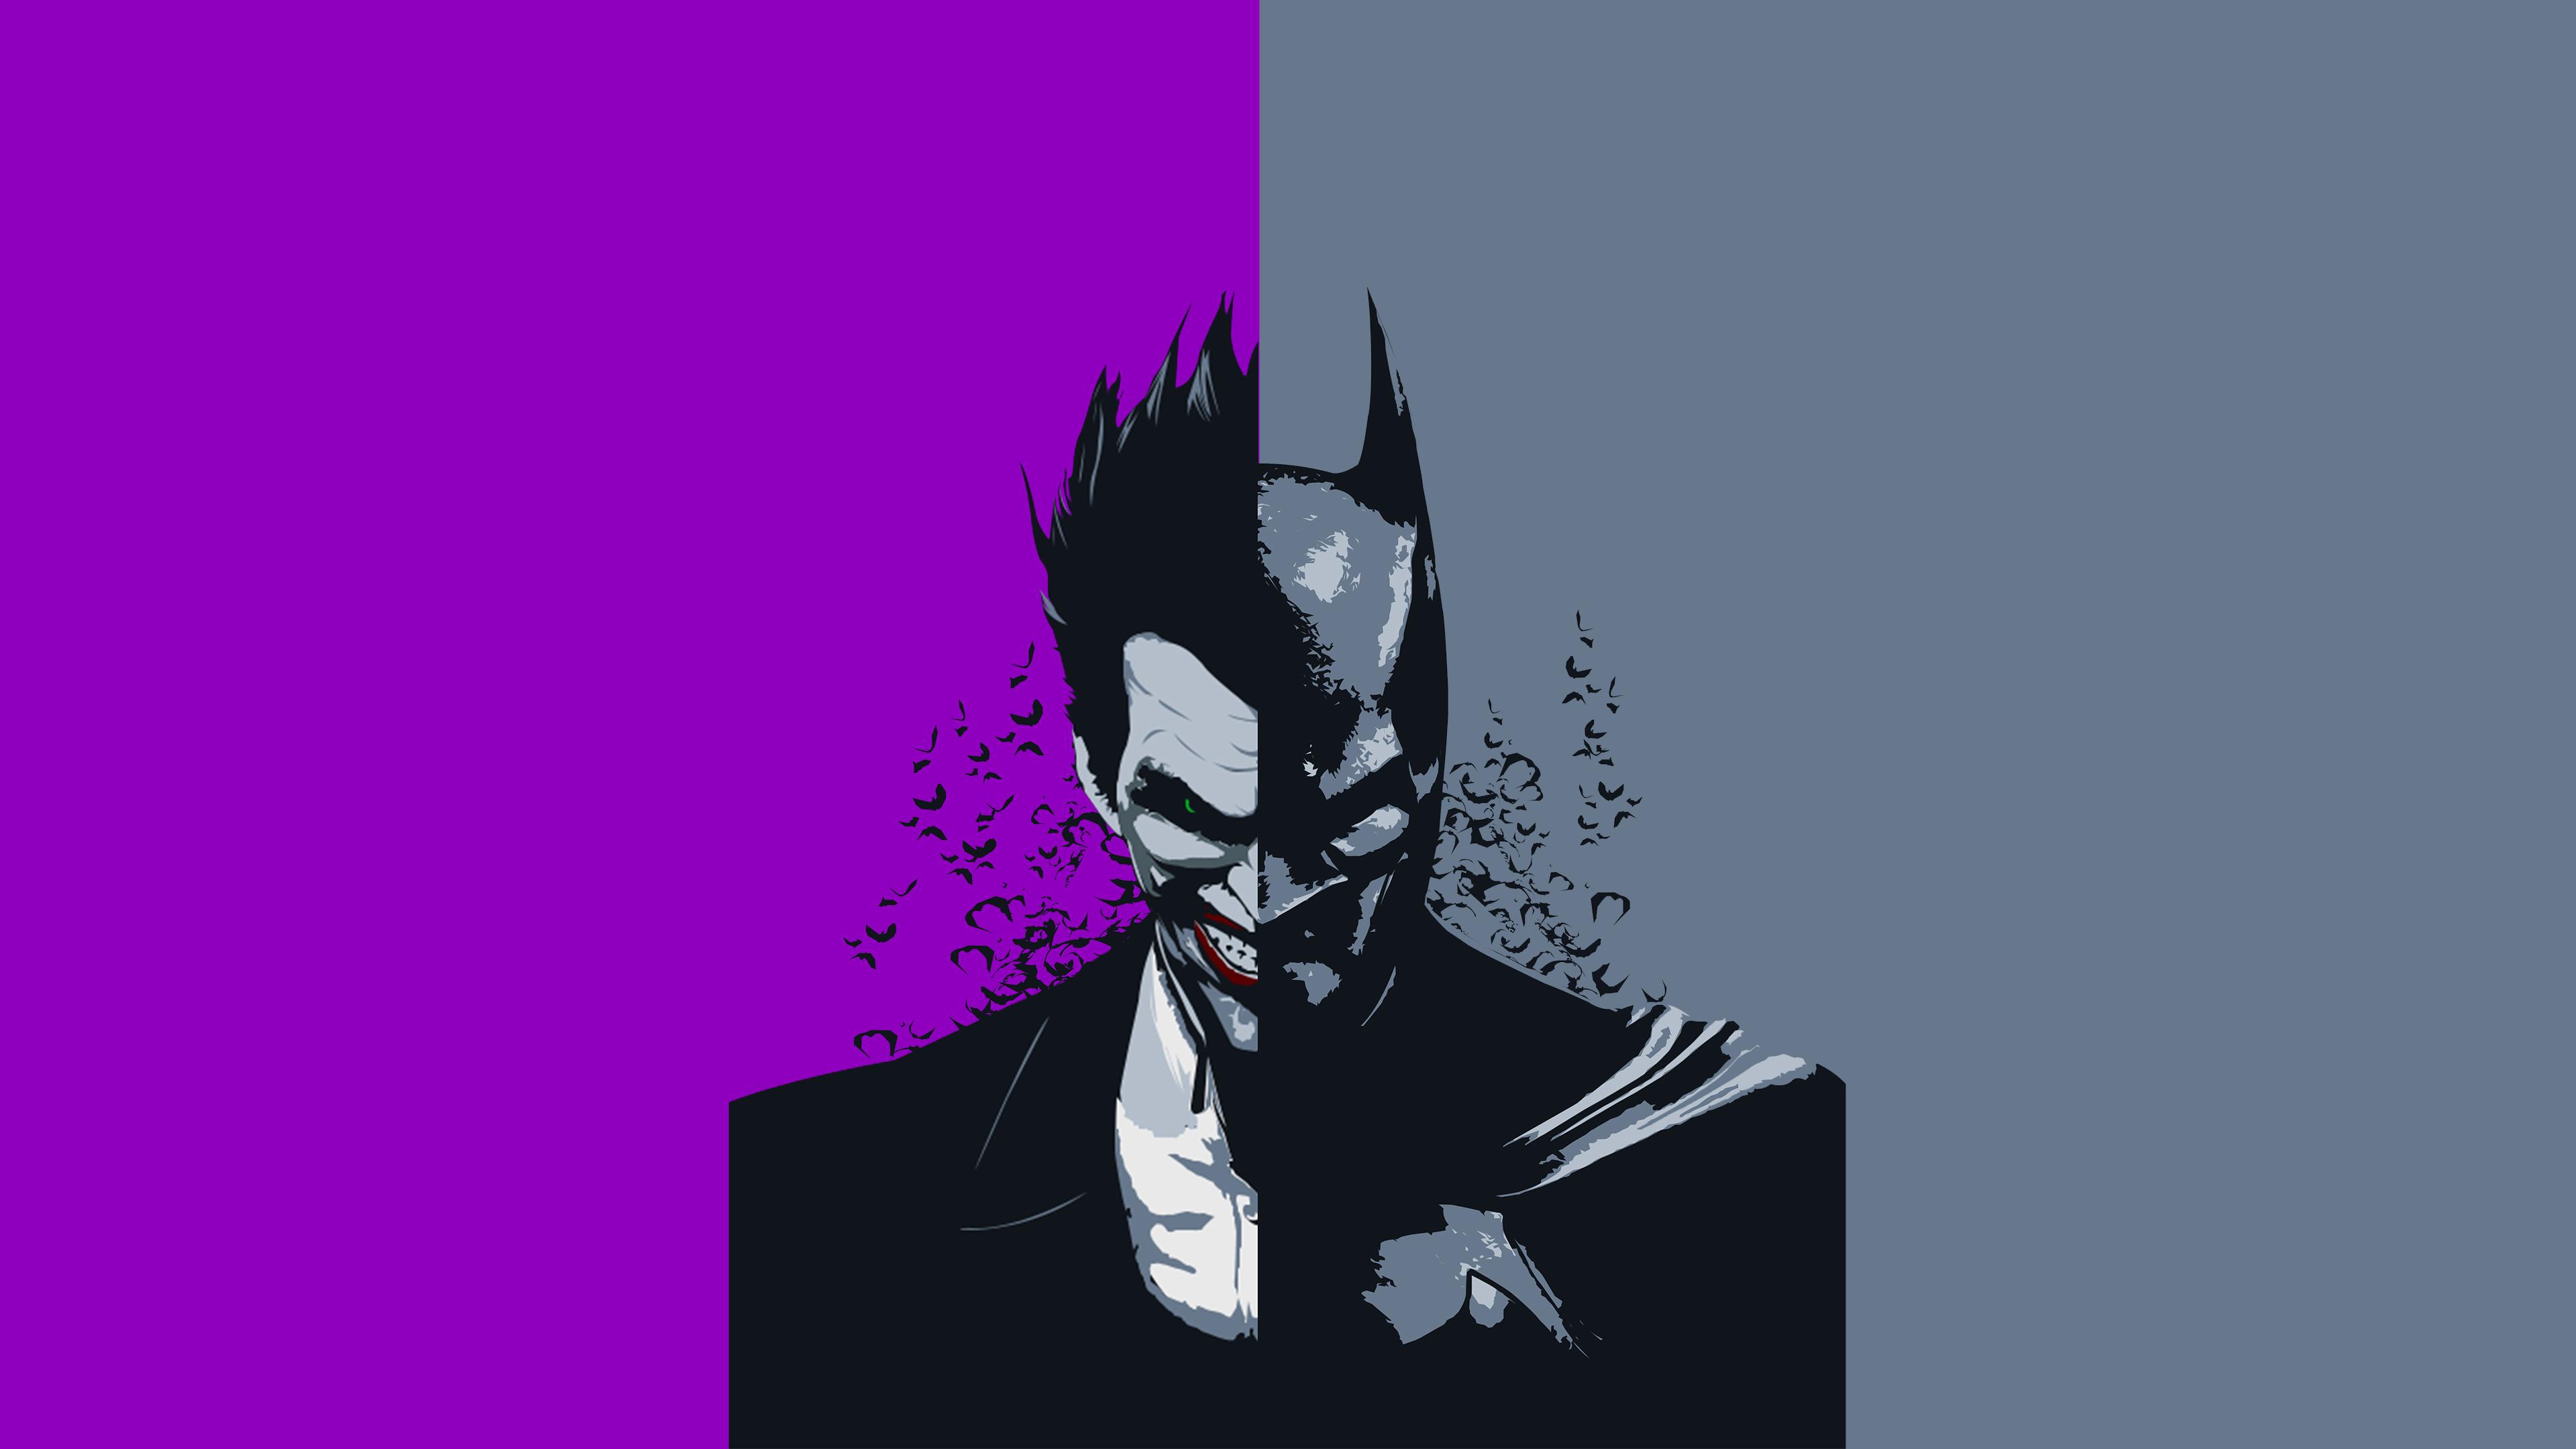 Batman Joker New Art Hd Superheroes 4k Wallpapers Images